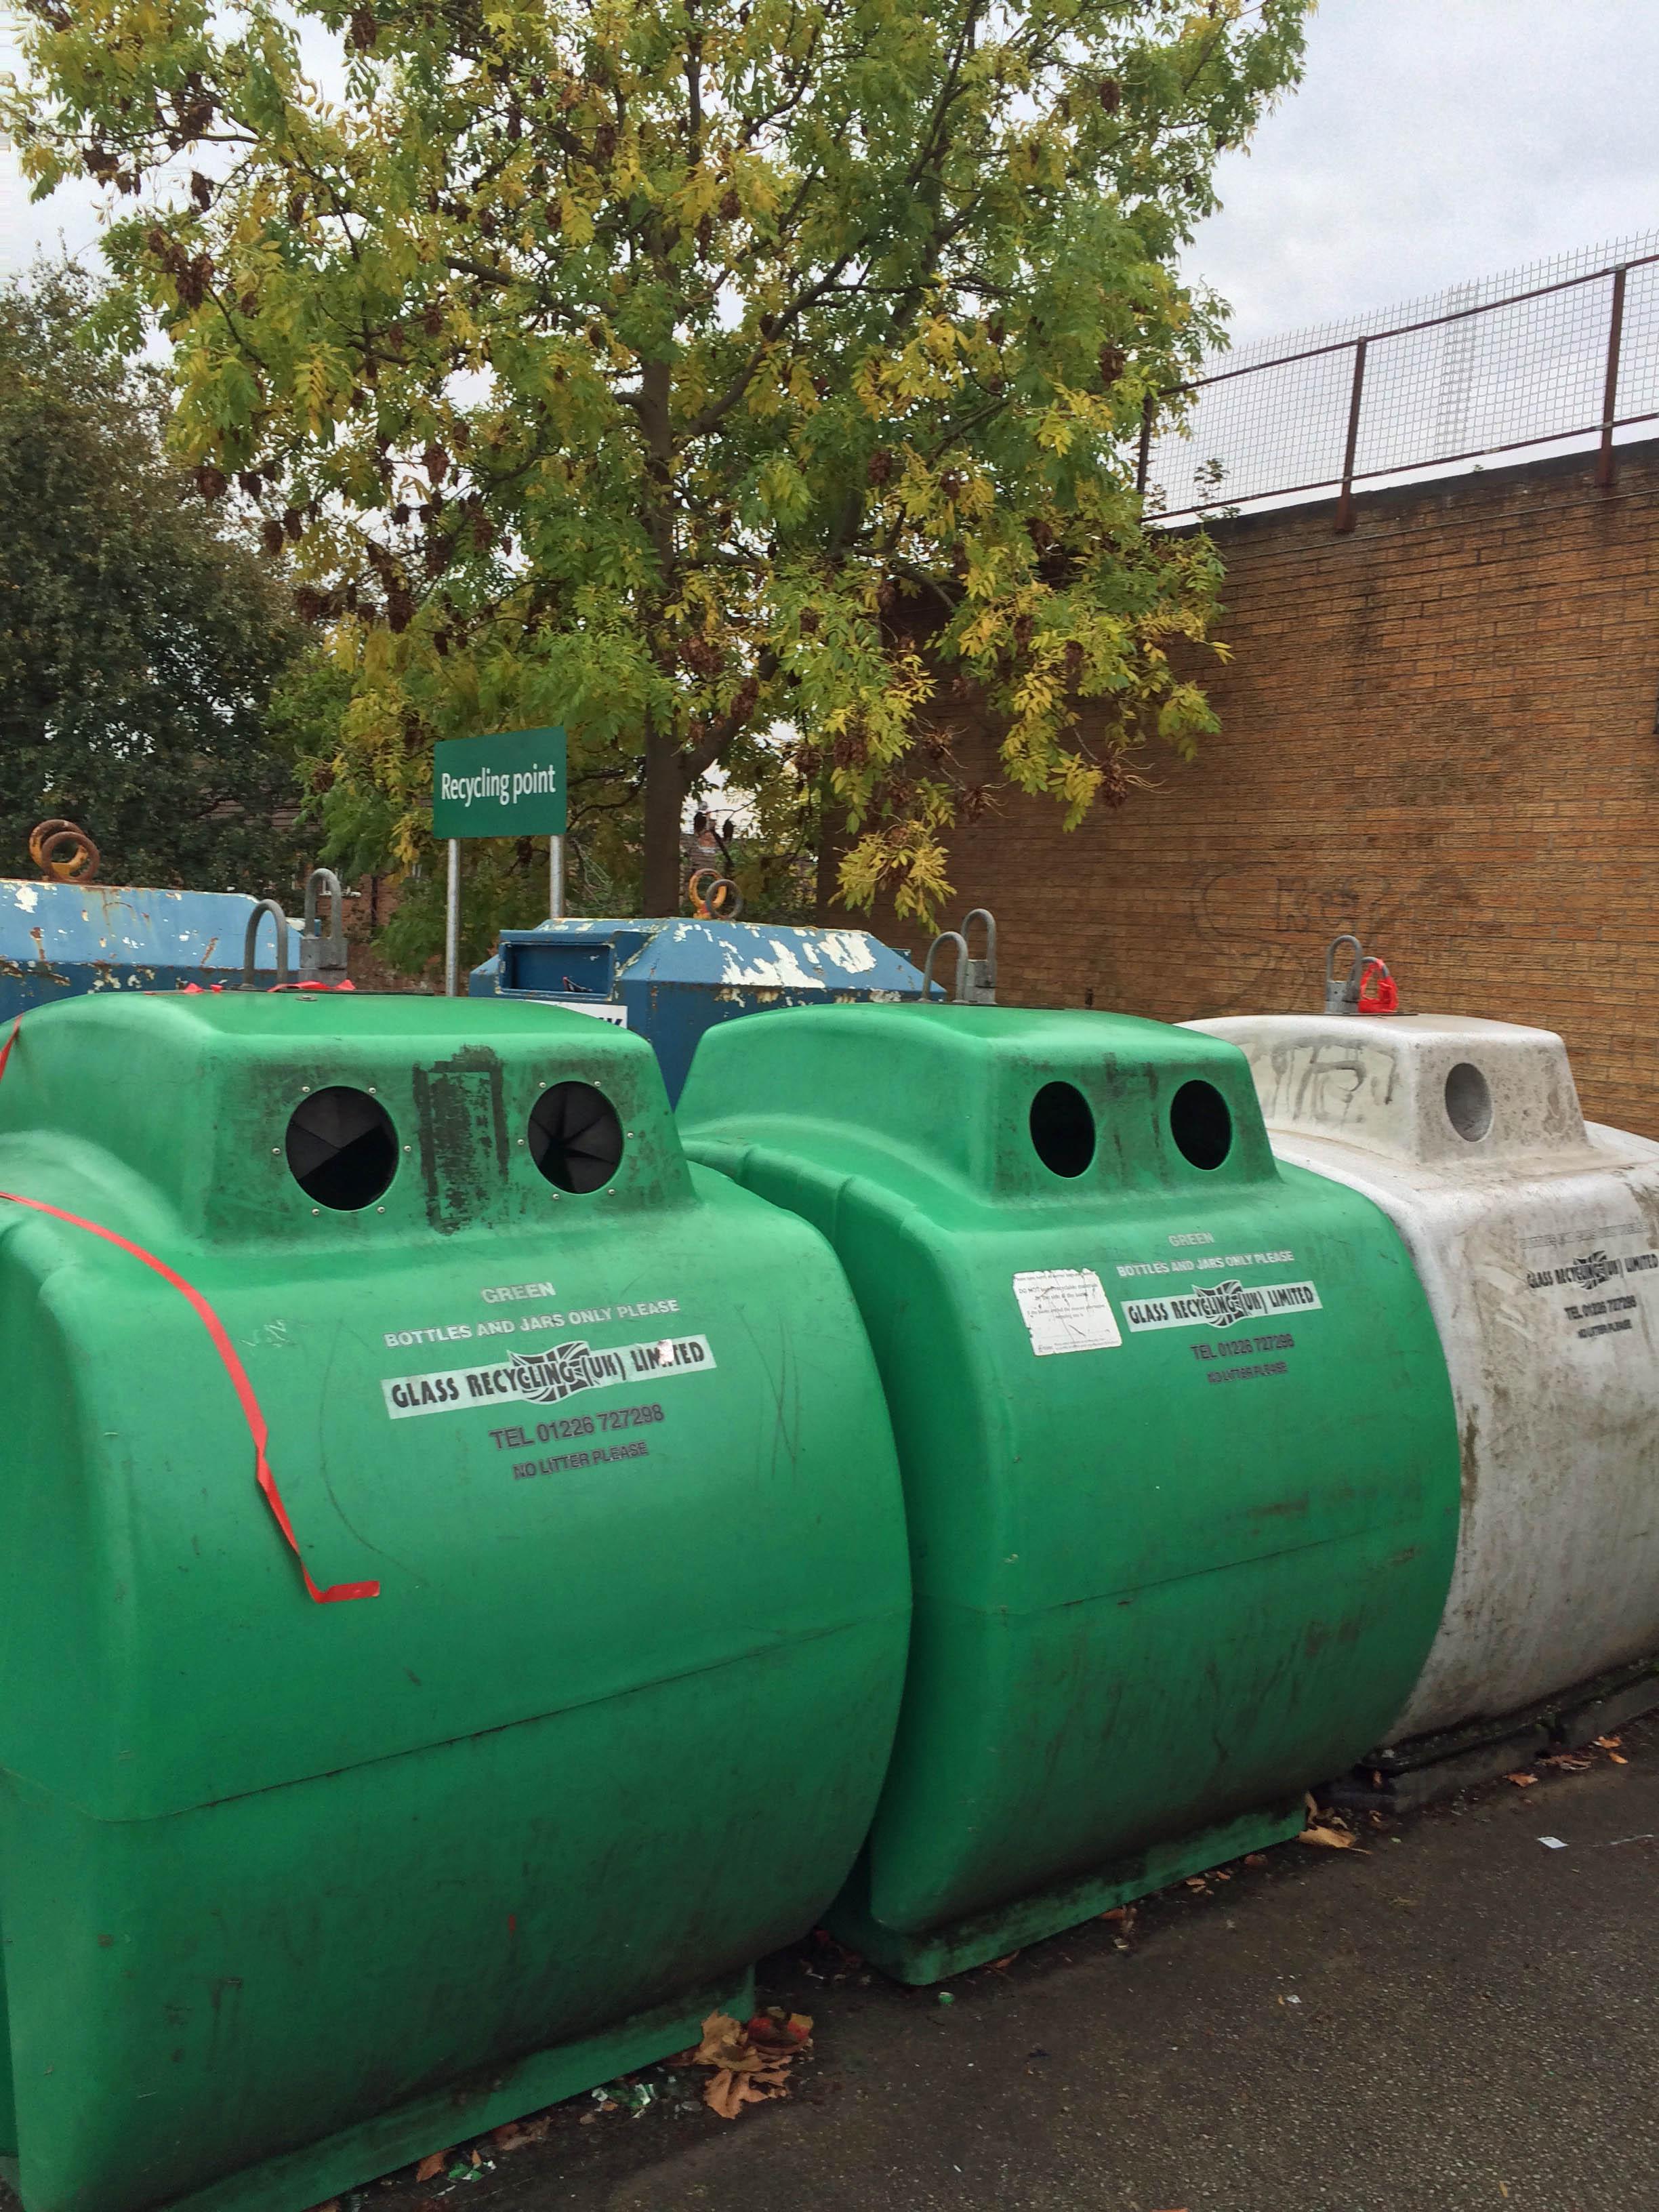 Recycling centre Acomb Car park 1700 17th Oct 2015